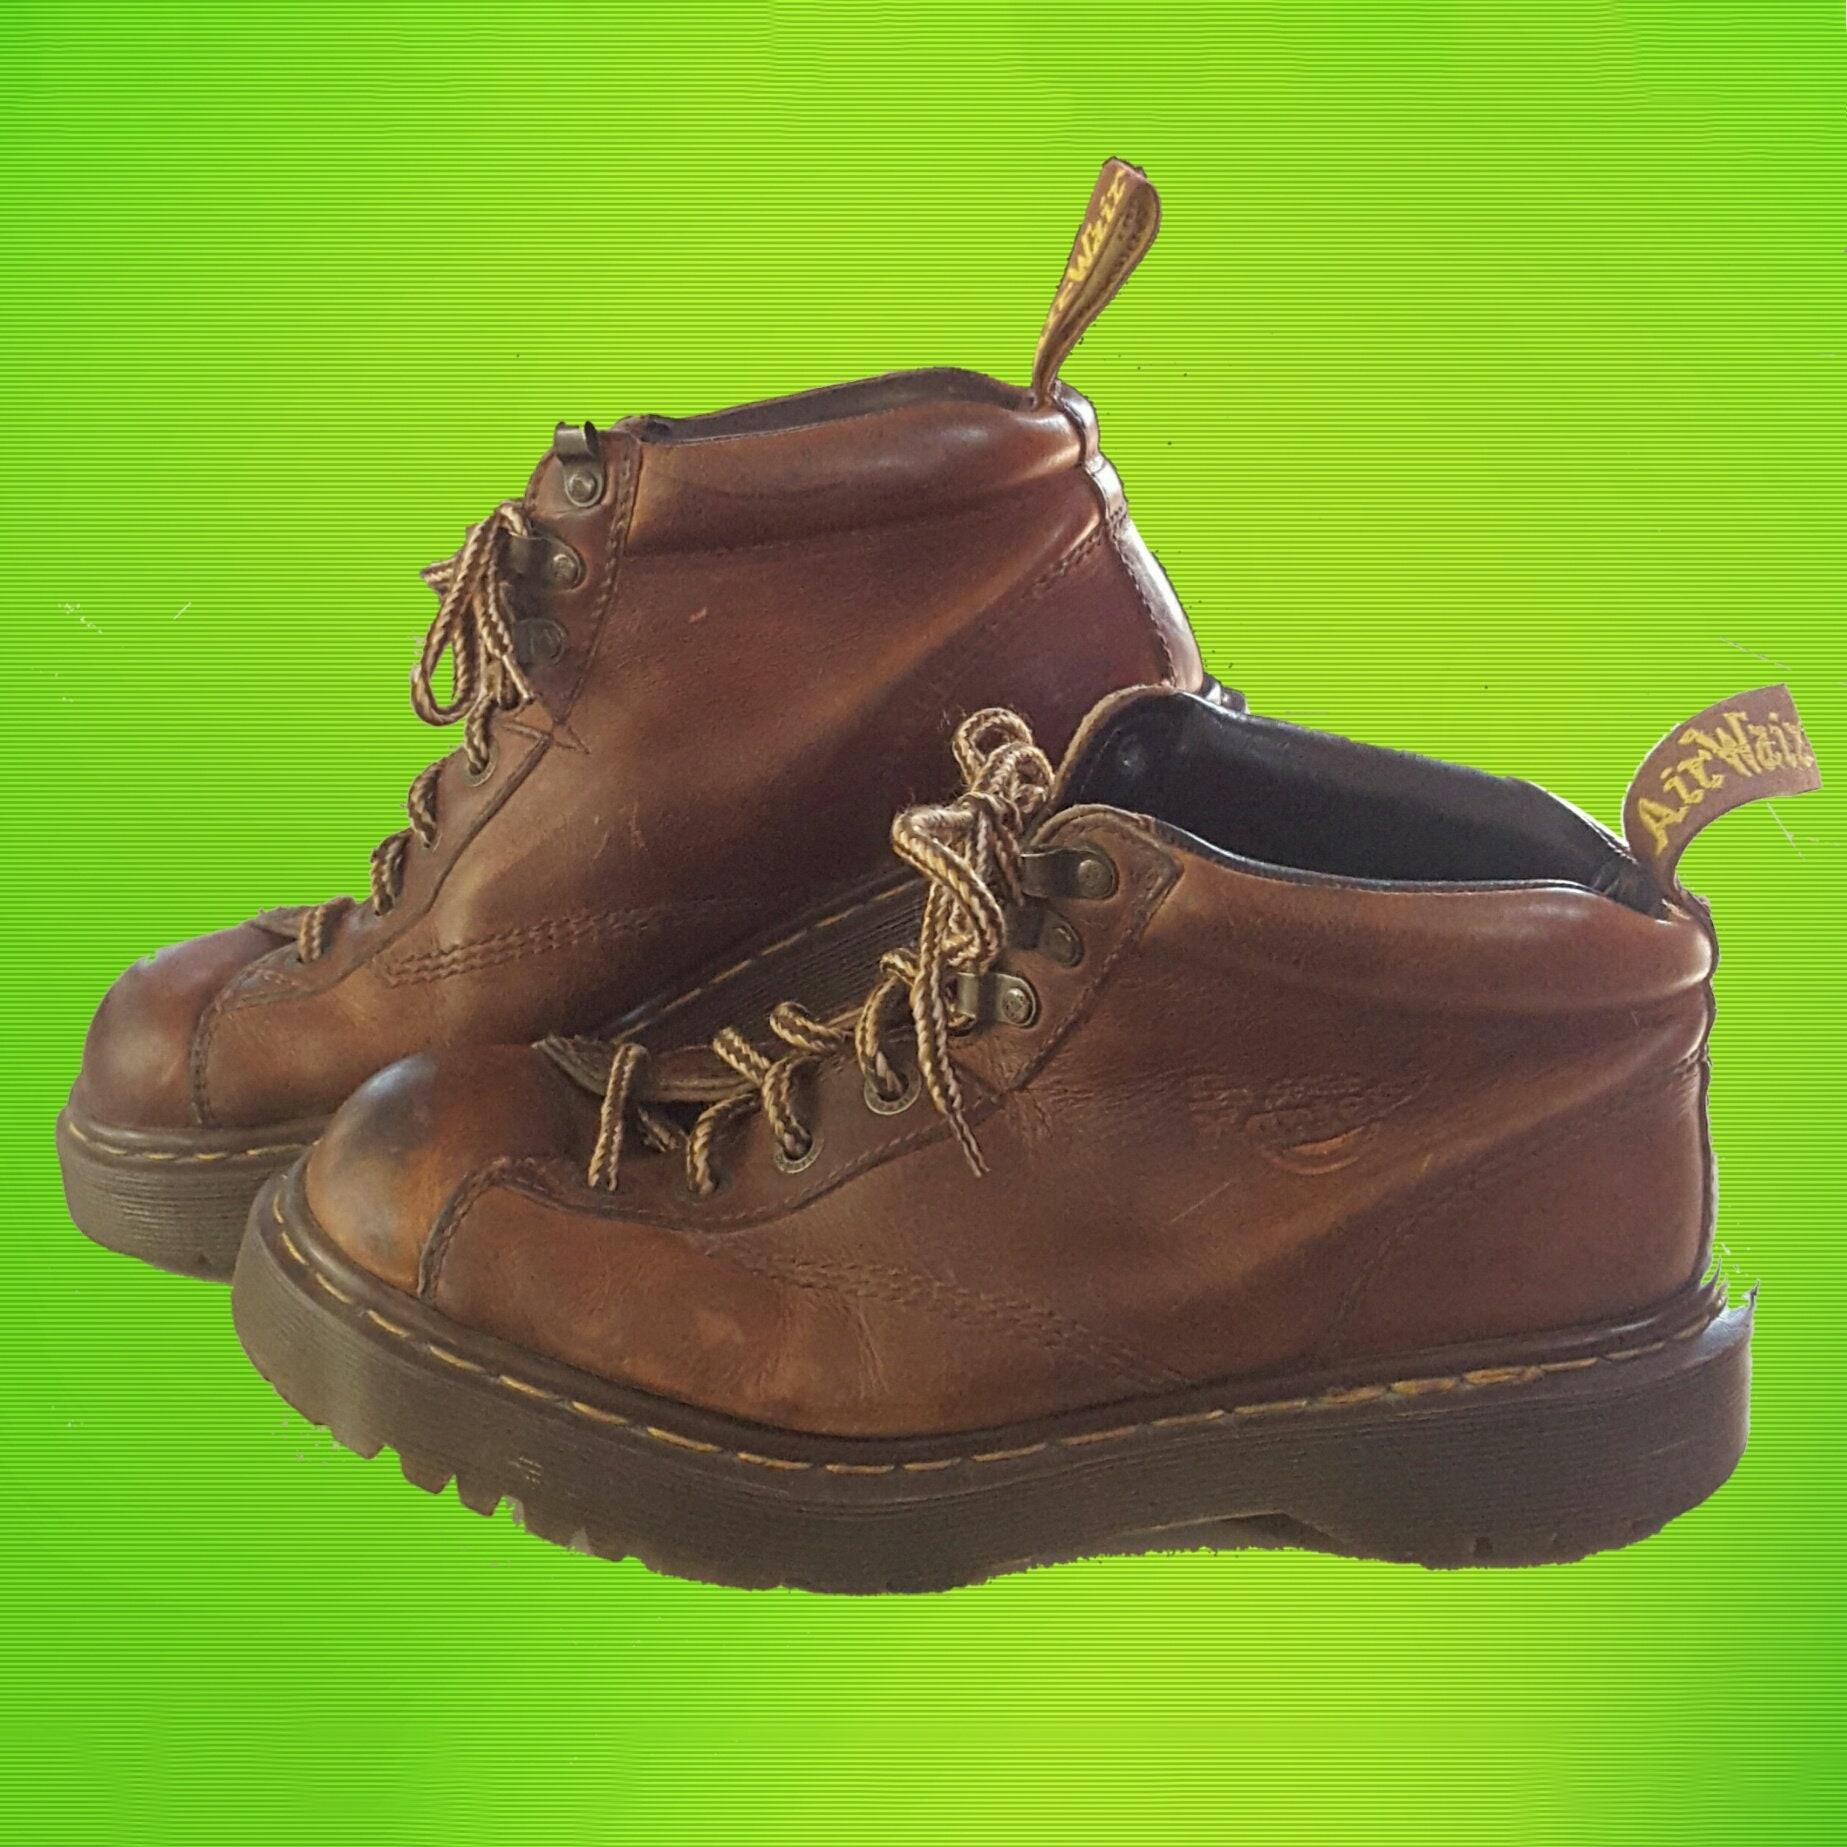 db62c11d139 Vintage 90's Doc Martens Classic Leather Boots - Lace-Up Ankle Flat ...